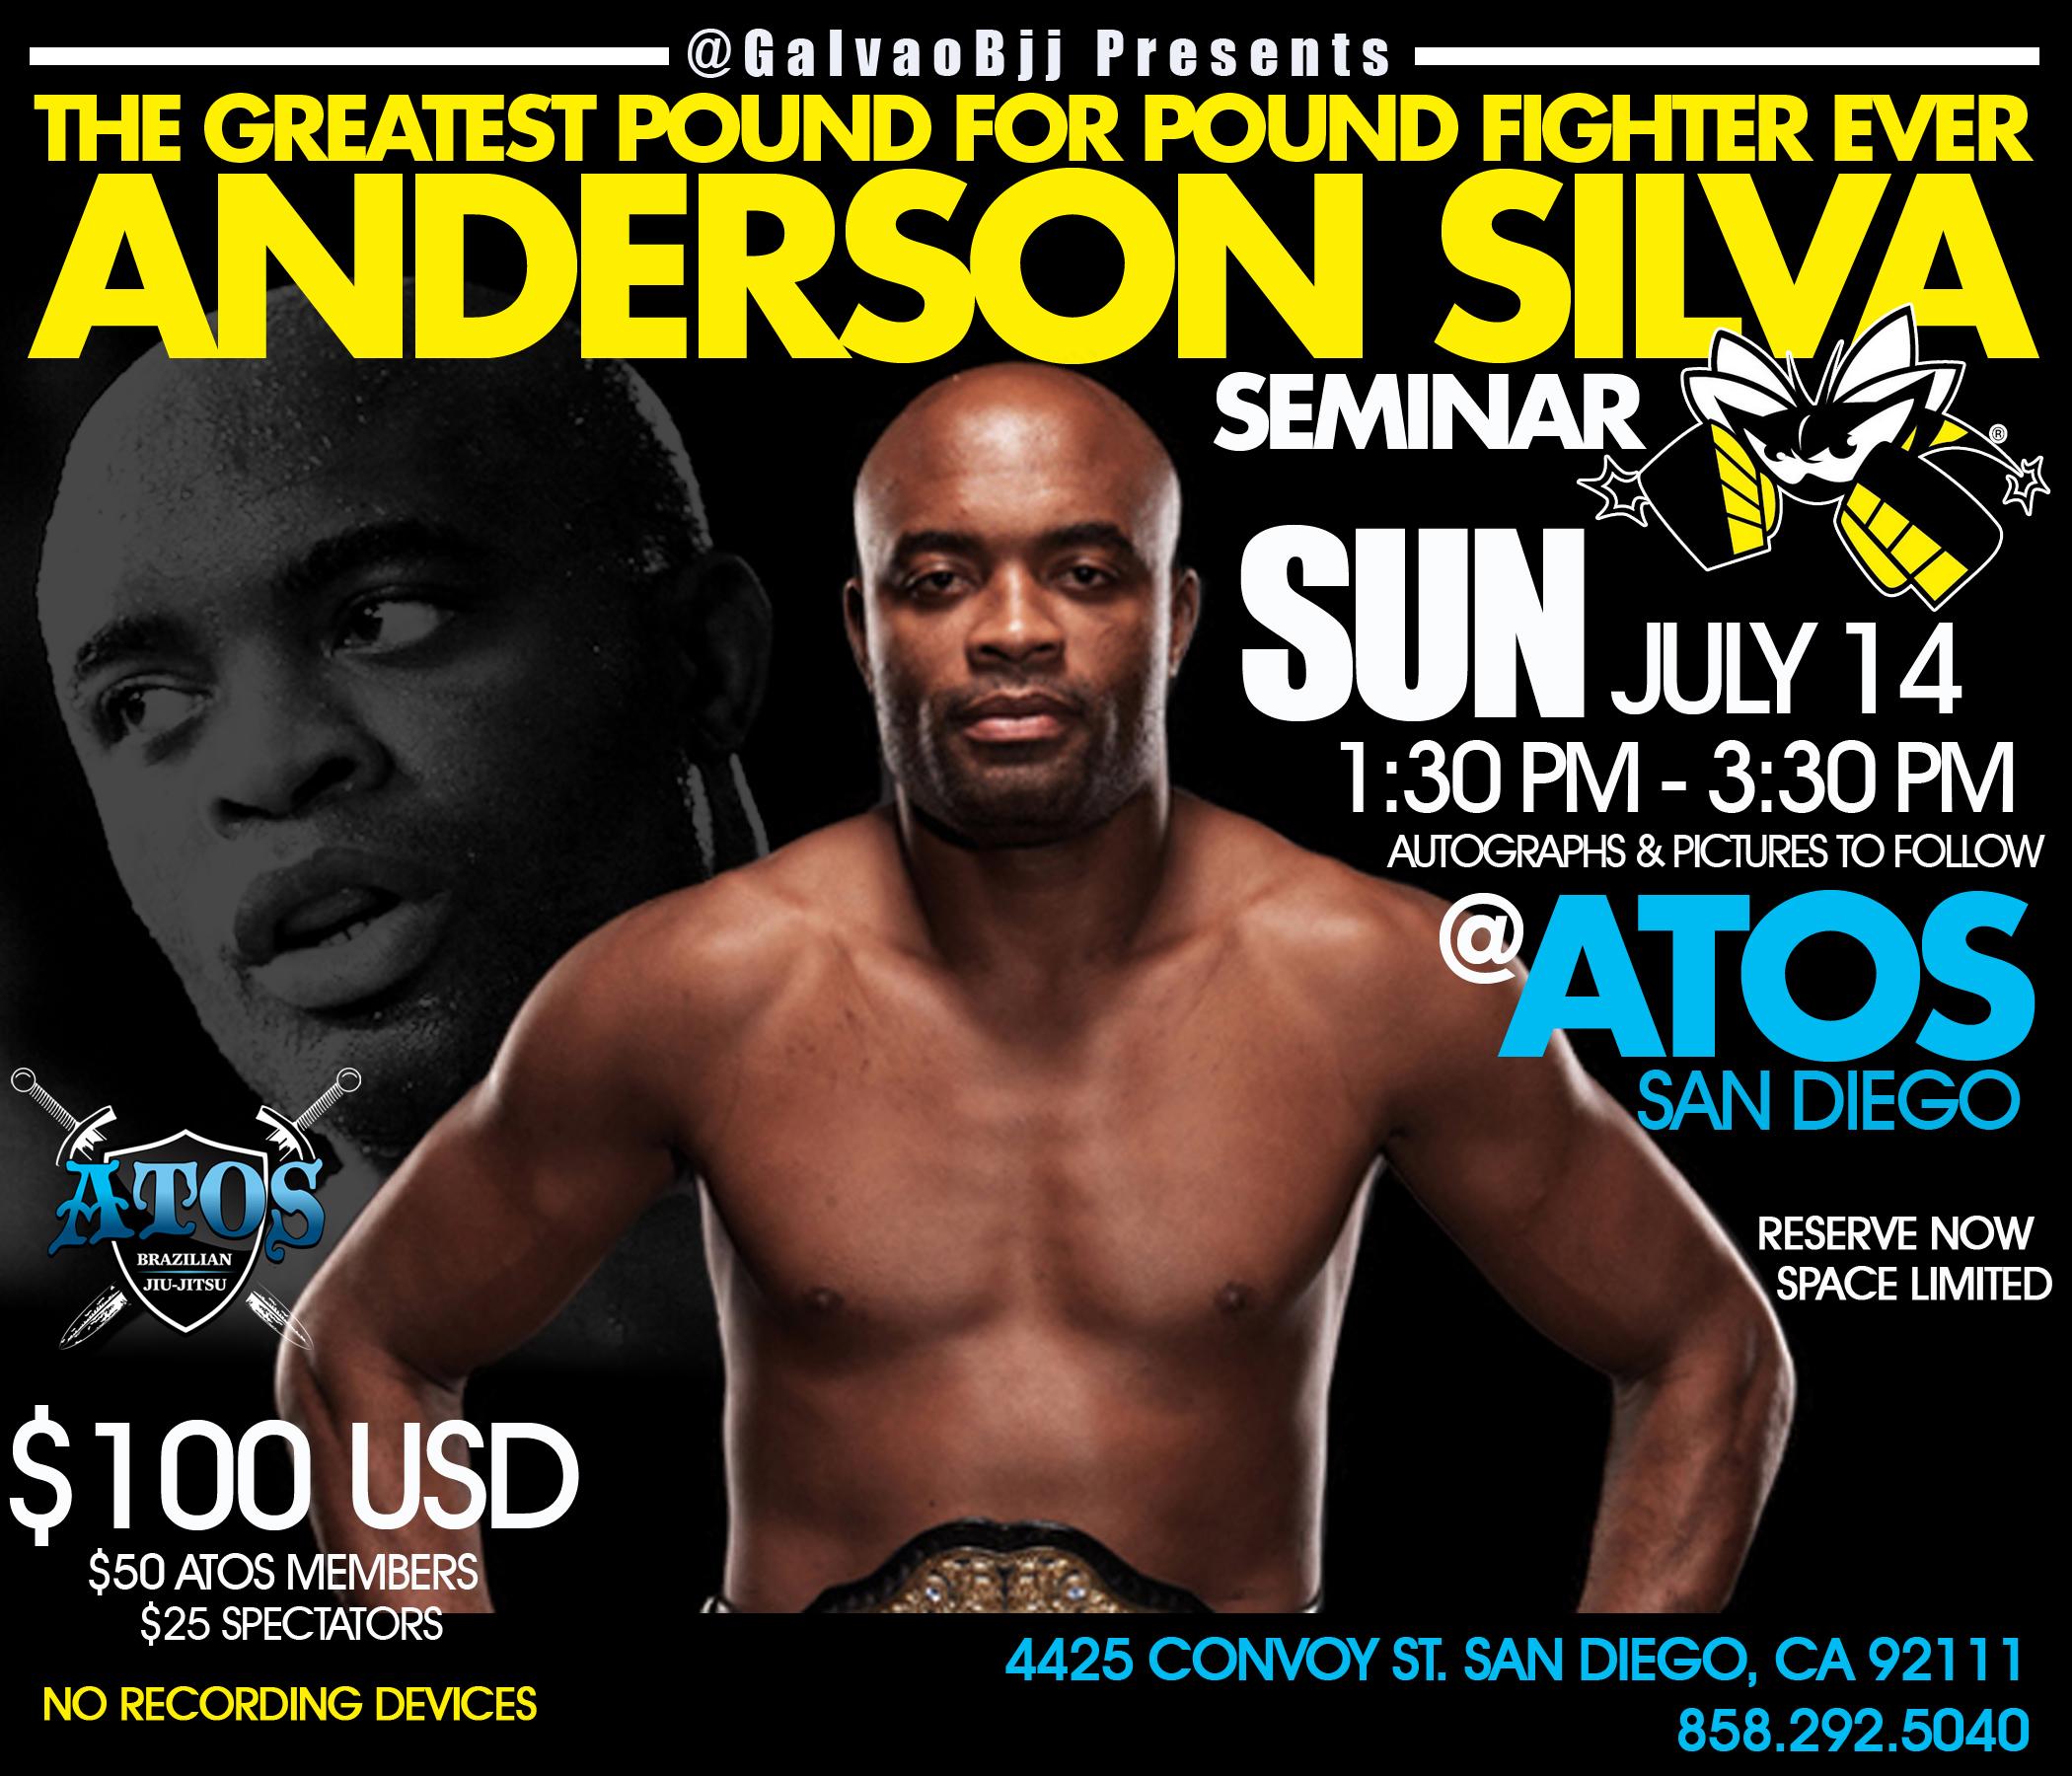 Anderson Silva Seminar